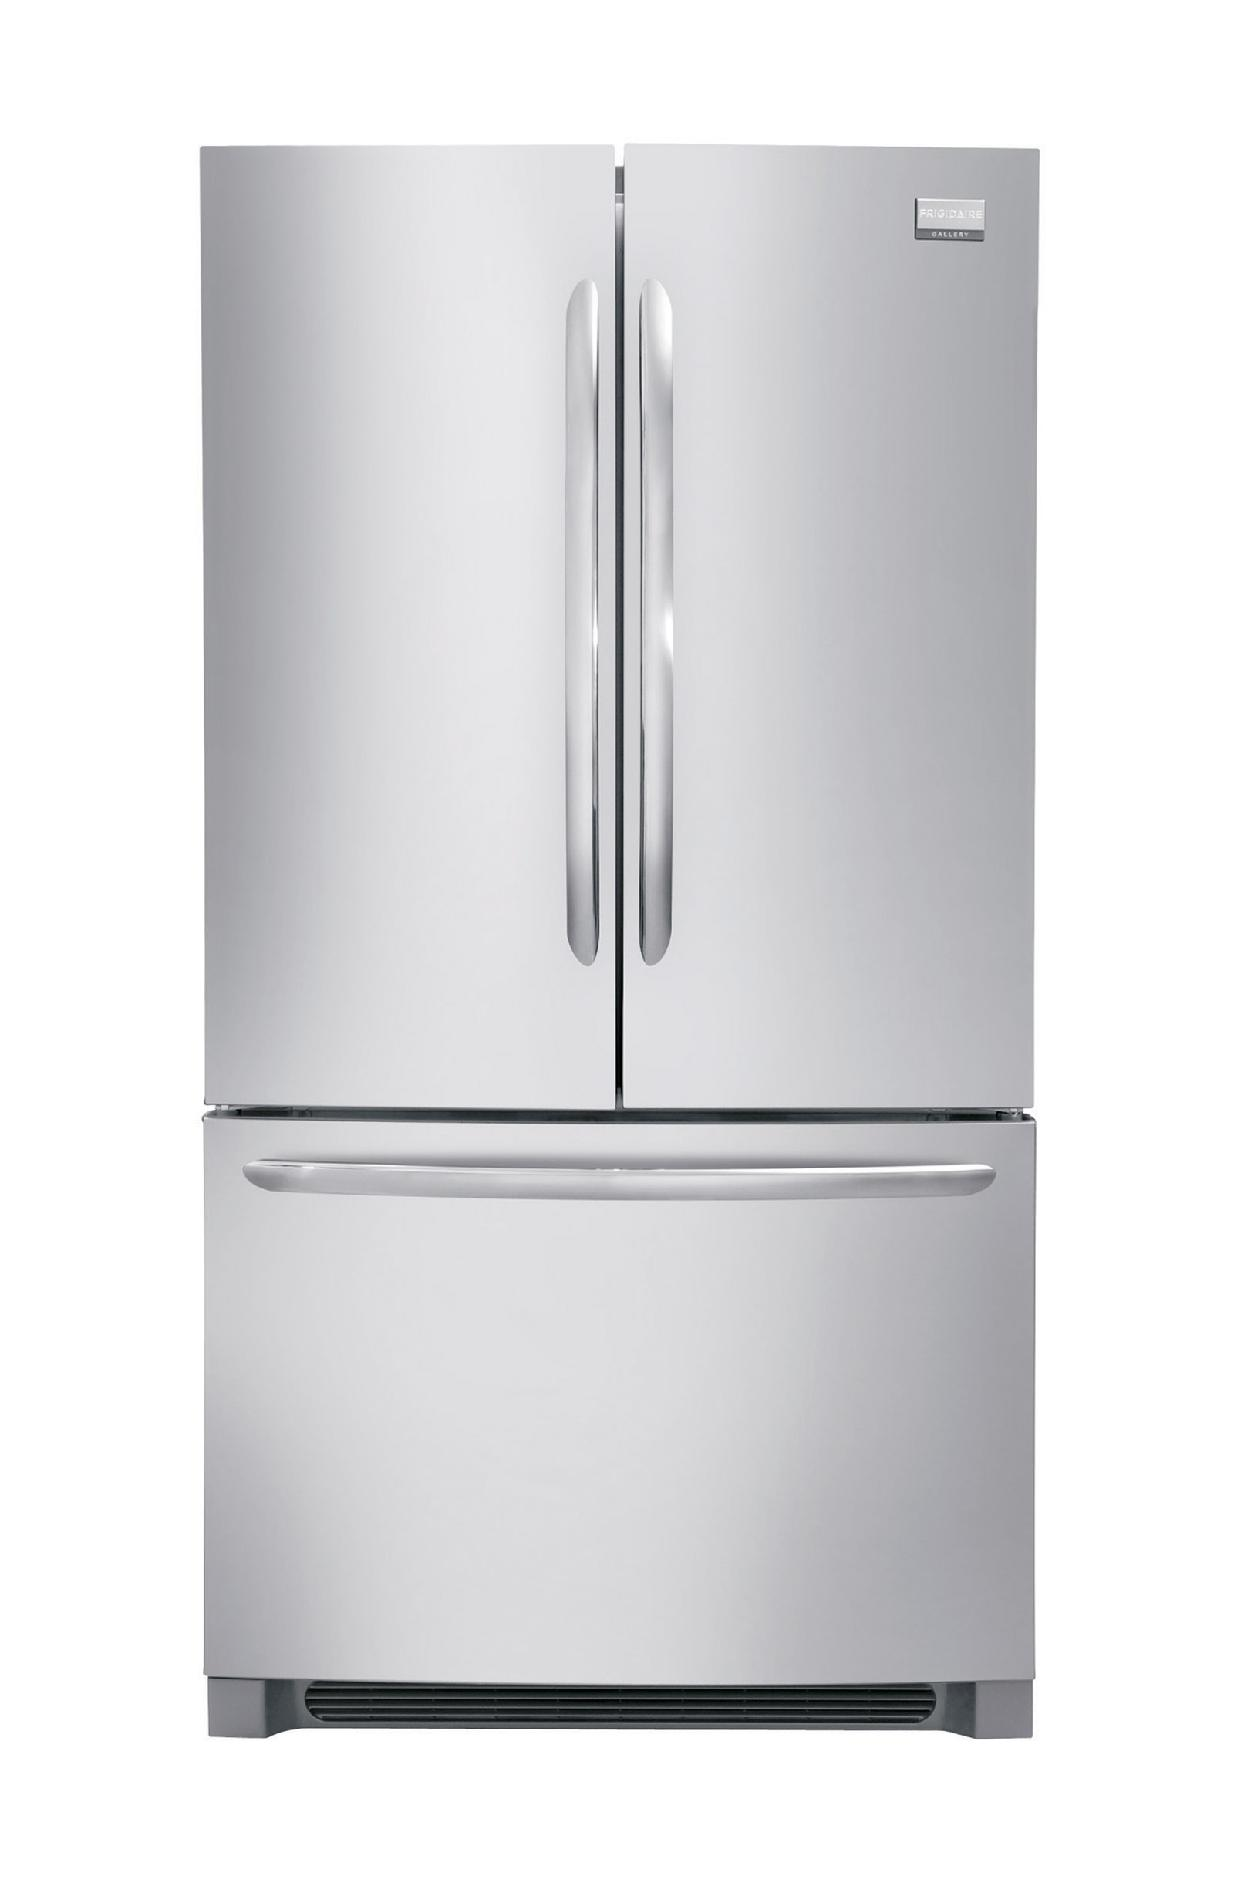 frigidaire kitchen appliances aid hand held mixer gallery 22 6 cu ft counter depth french door